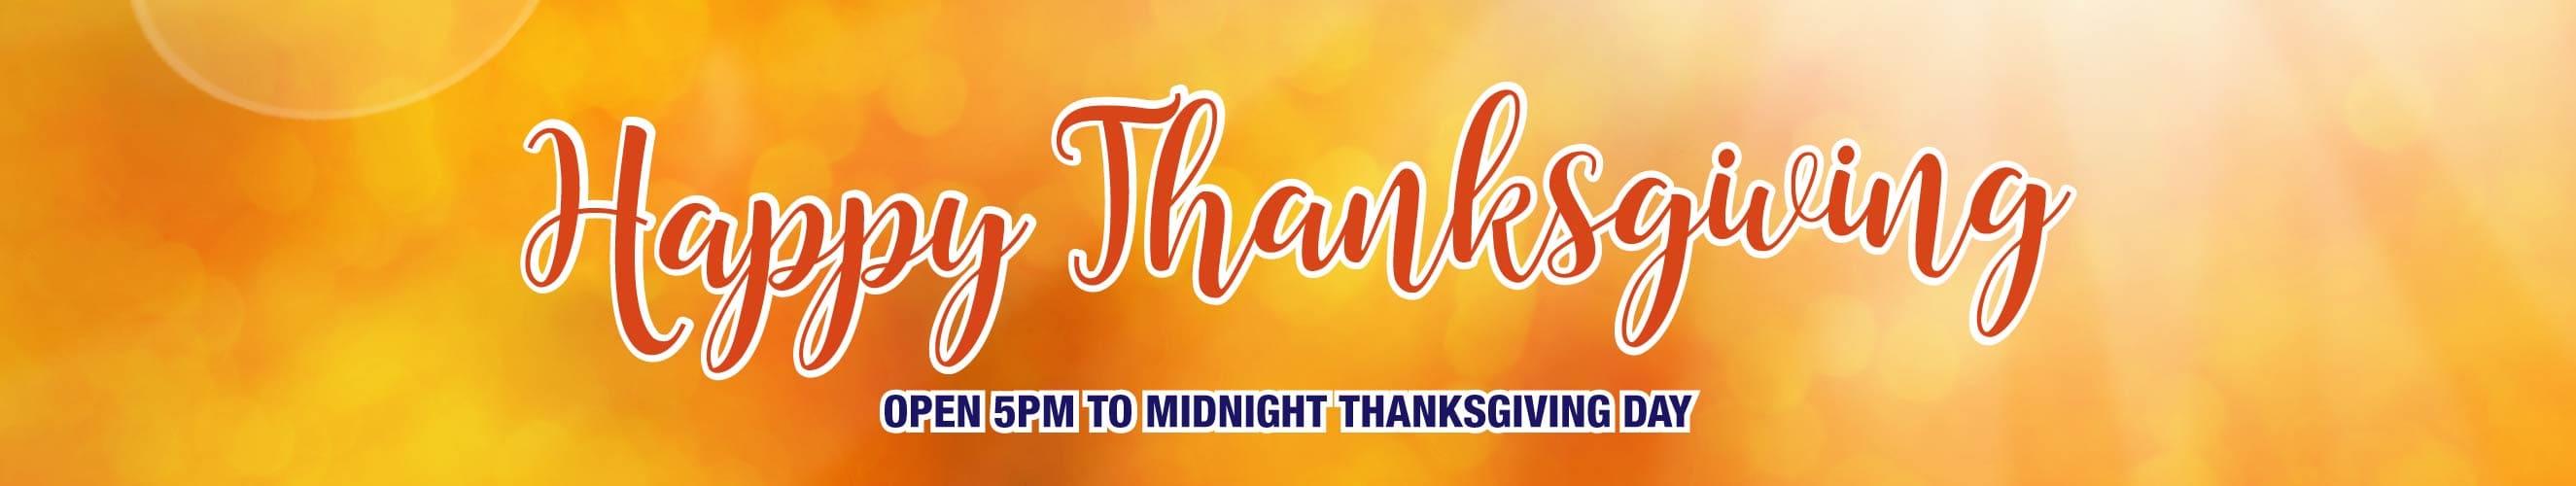 Happy Thanksgiving! Open 5pm - Midnight.